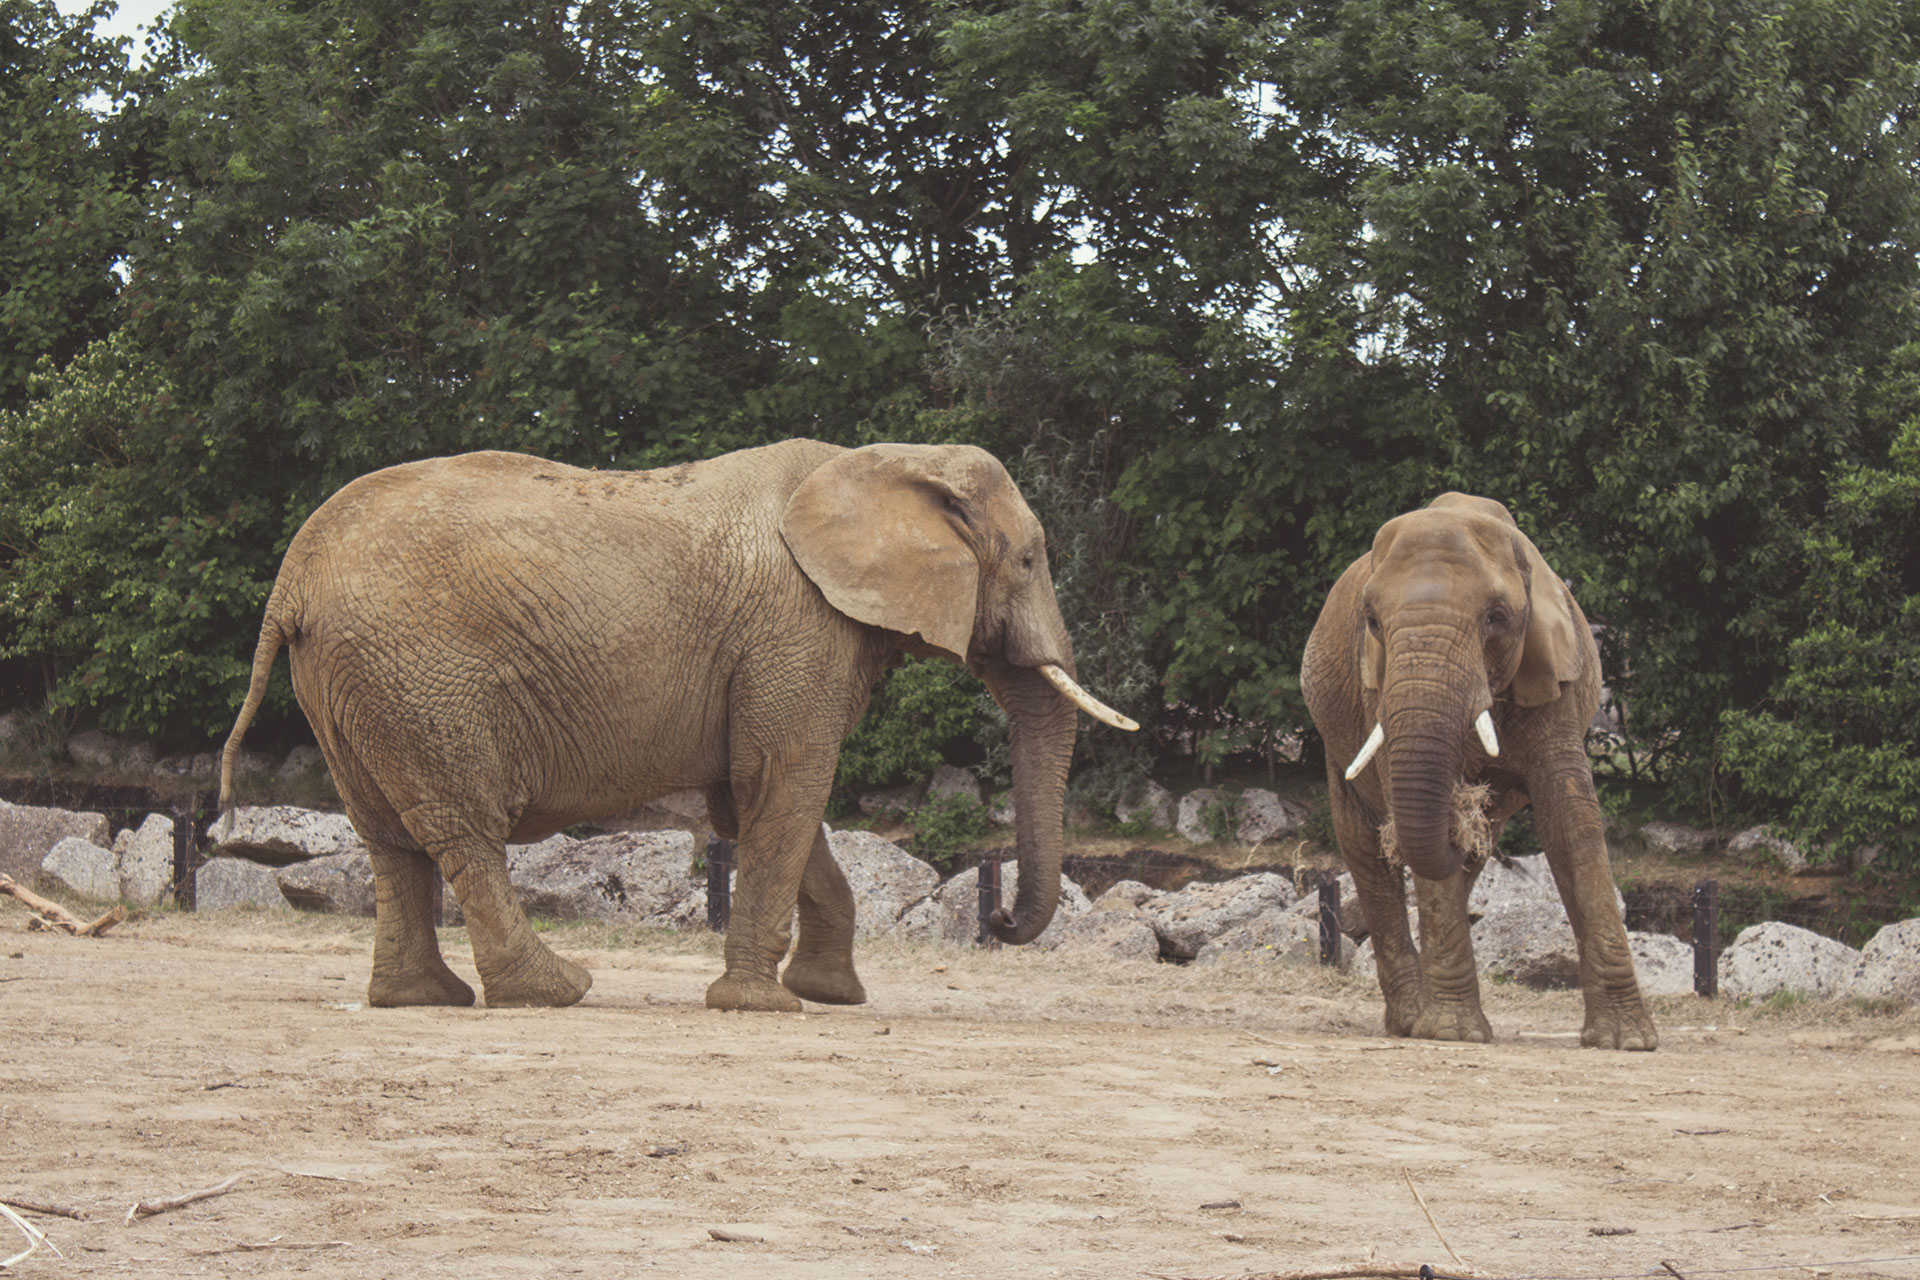 elephants animal africa namibia mozambique wildlife desert elephant zoo niassa african animals reserve rights pexels issues block polar paradise mammal